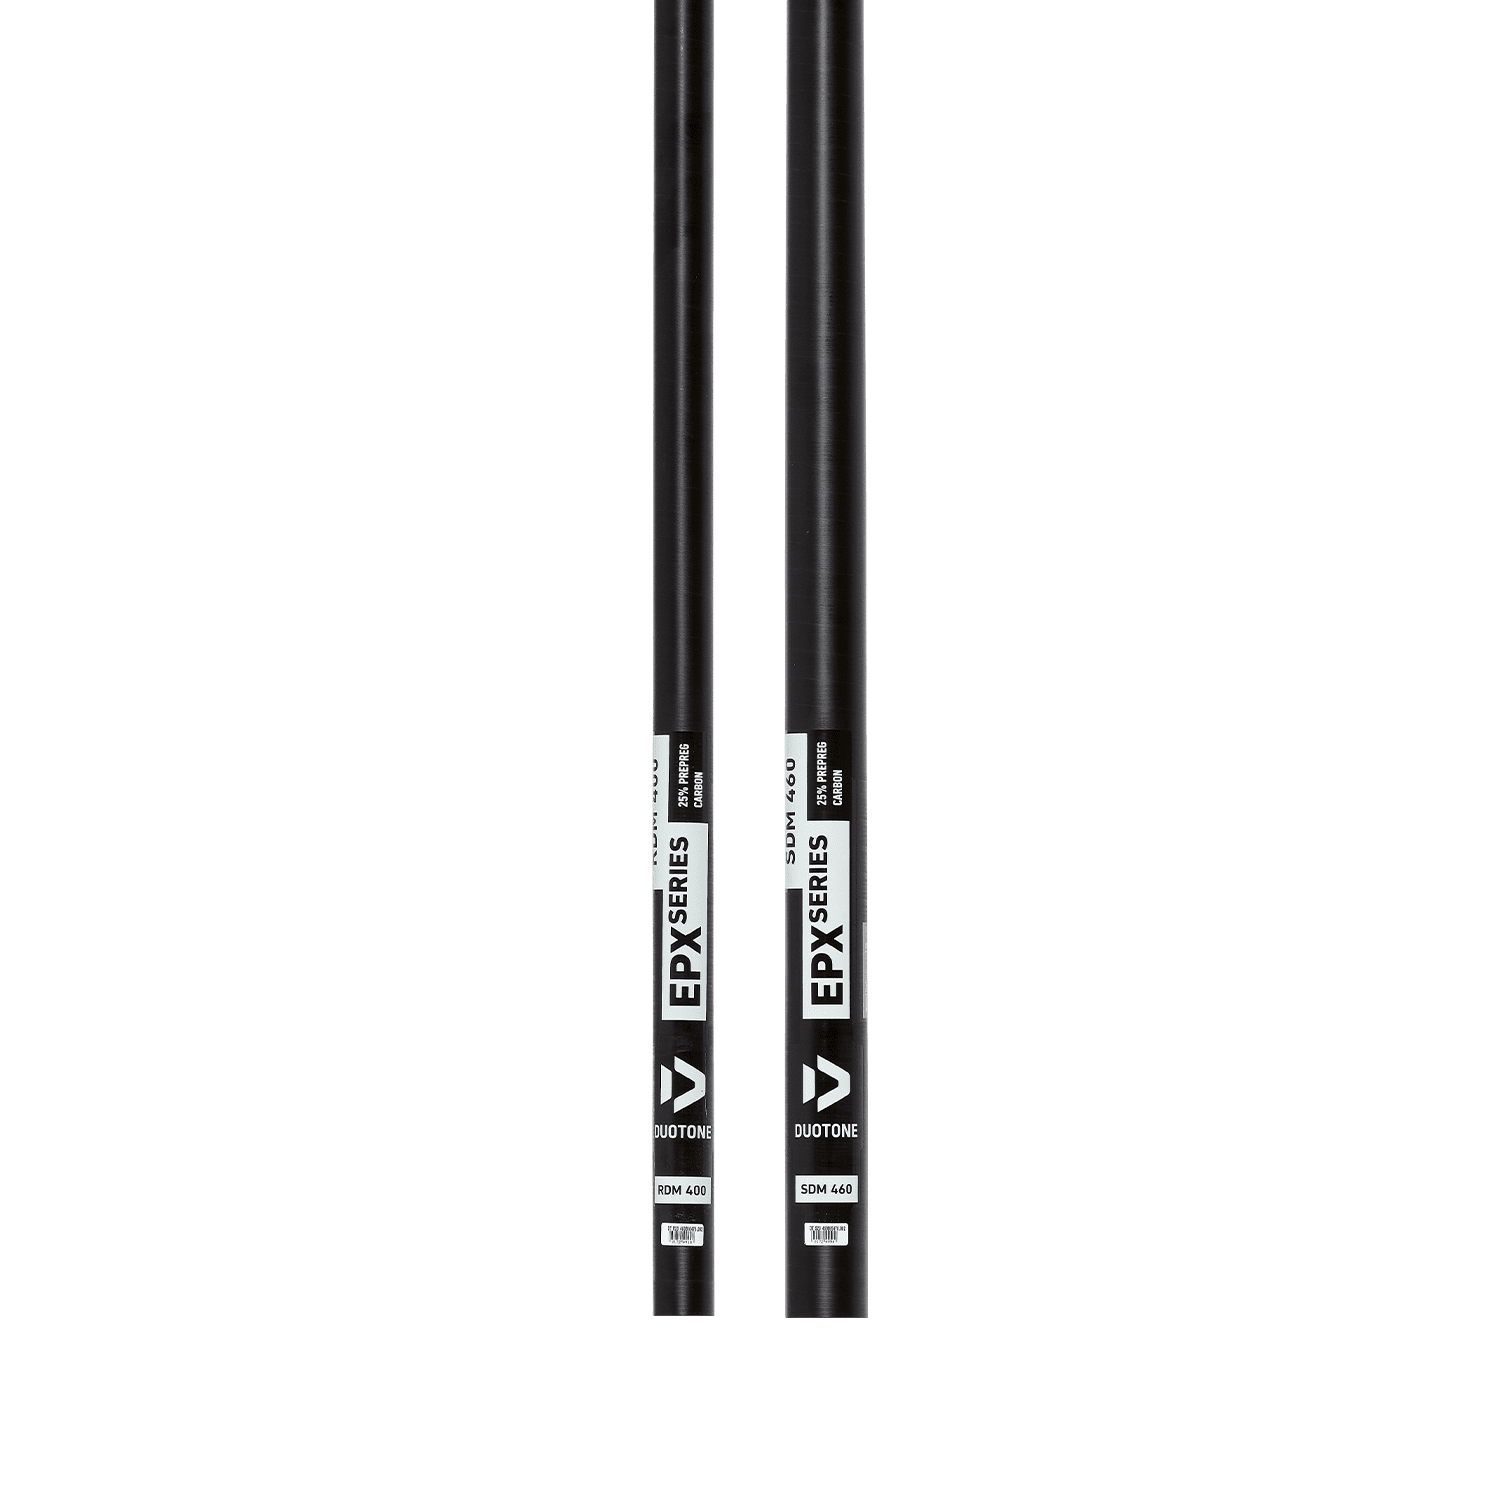 Duotone EPX RDM Mast